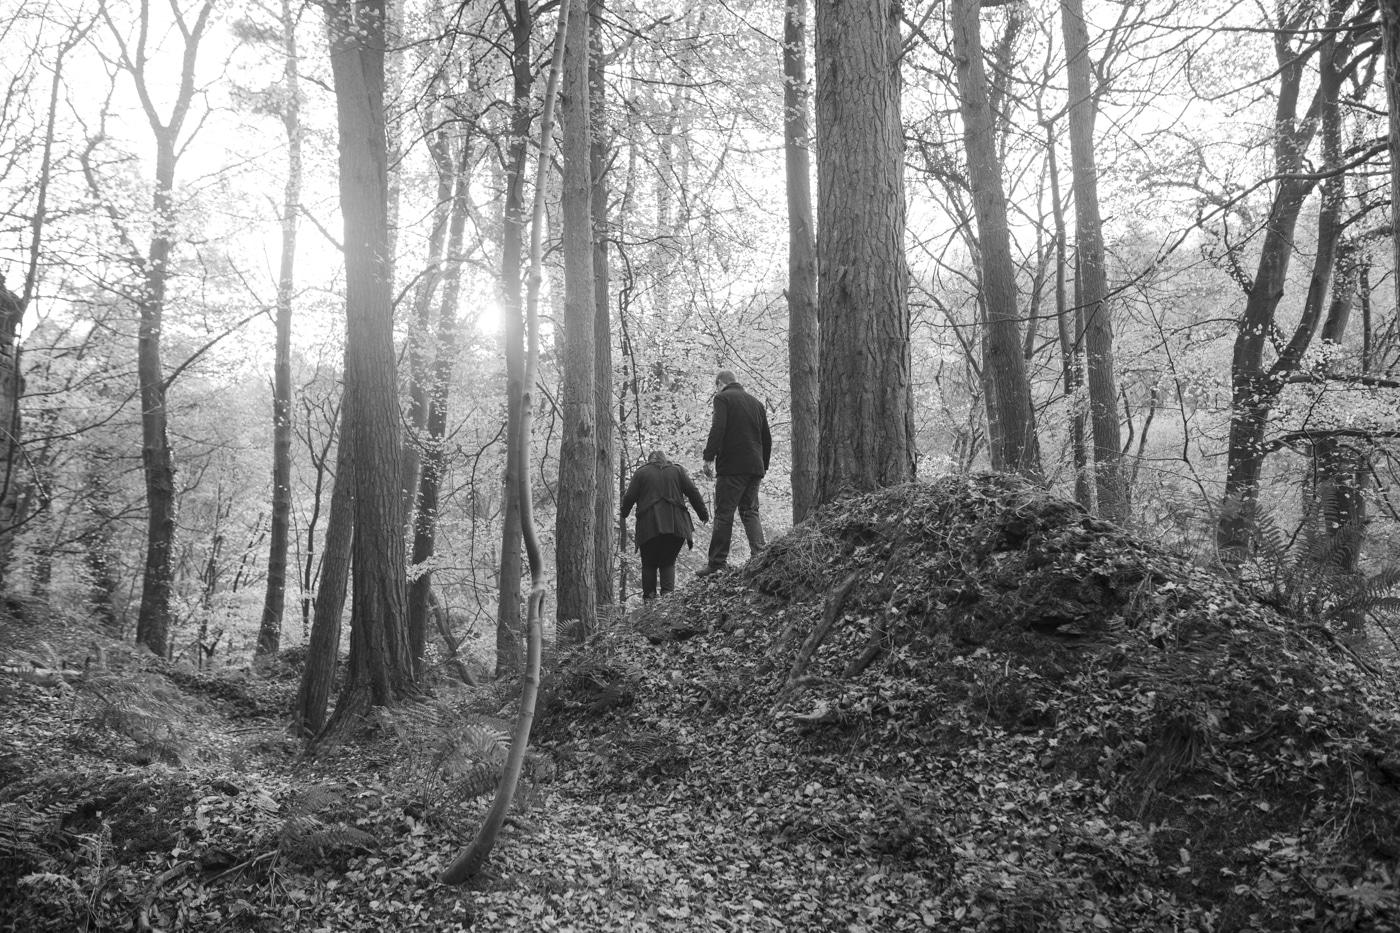 Man and woman walking through tall woods by Joshua Wyborn